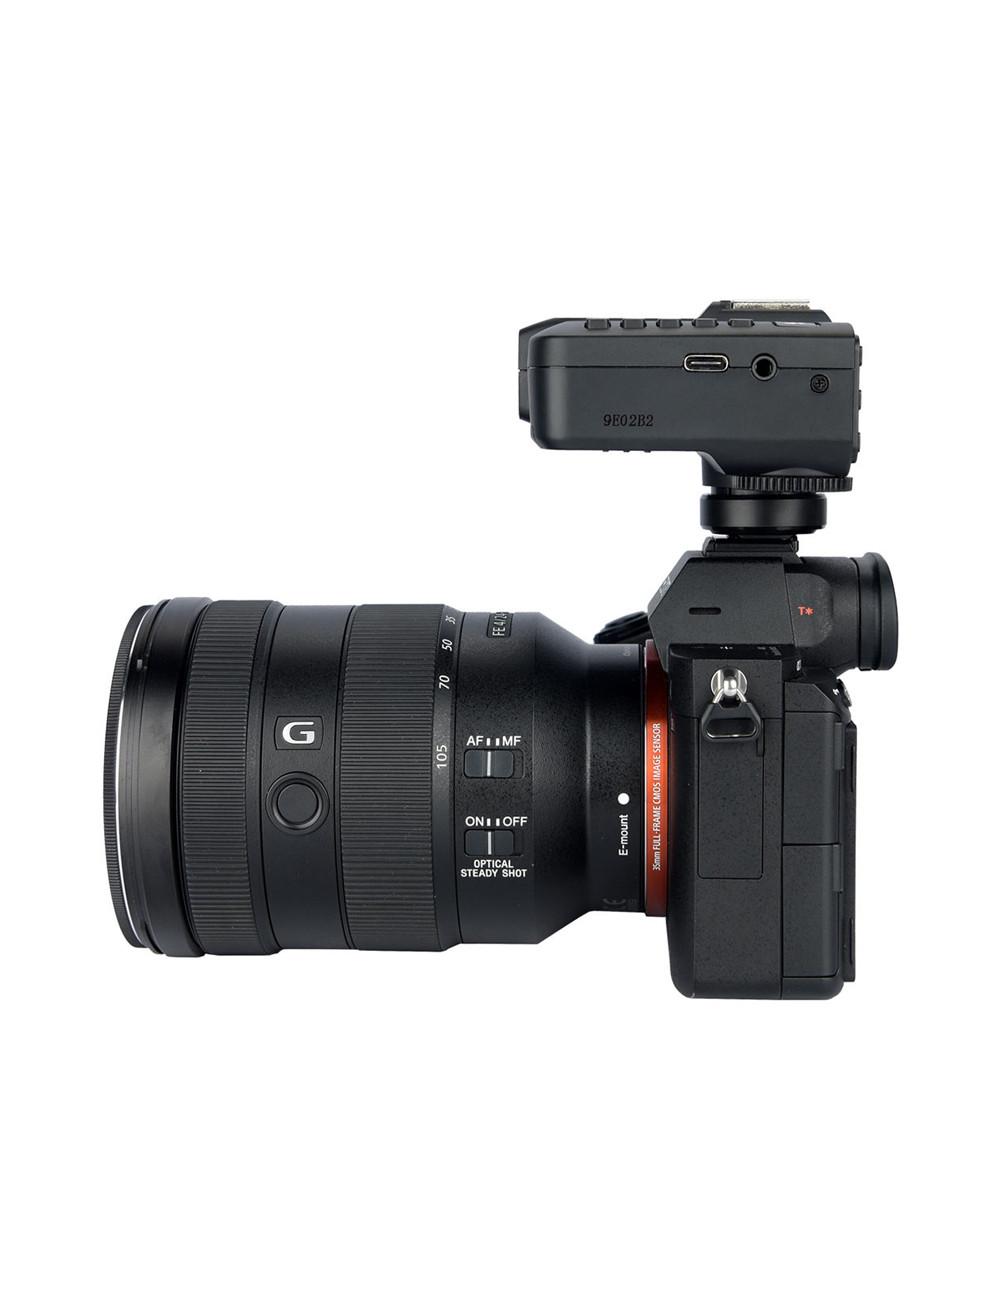 Lente Tamron para Nikon 15-30mm F/2.8 Di VC USD G2 Zoom en Chile Apertura.cl